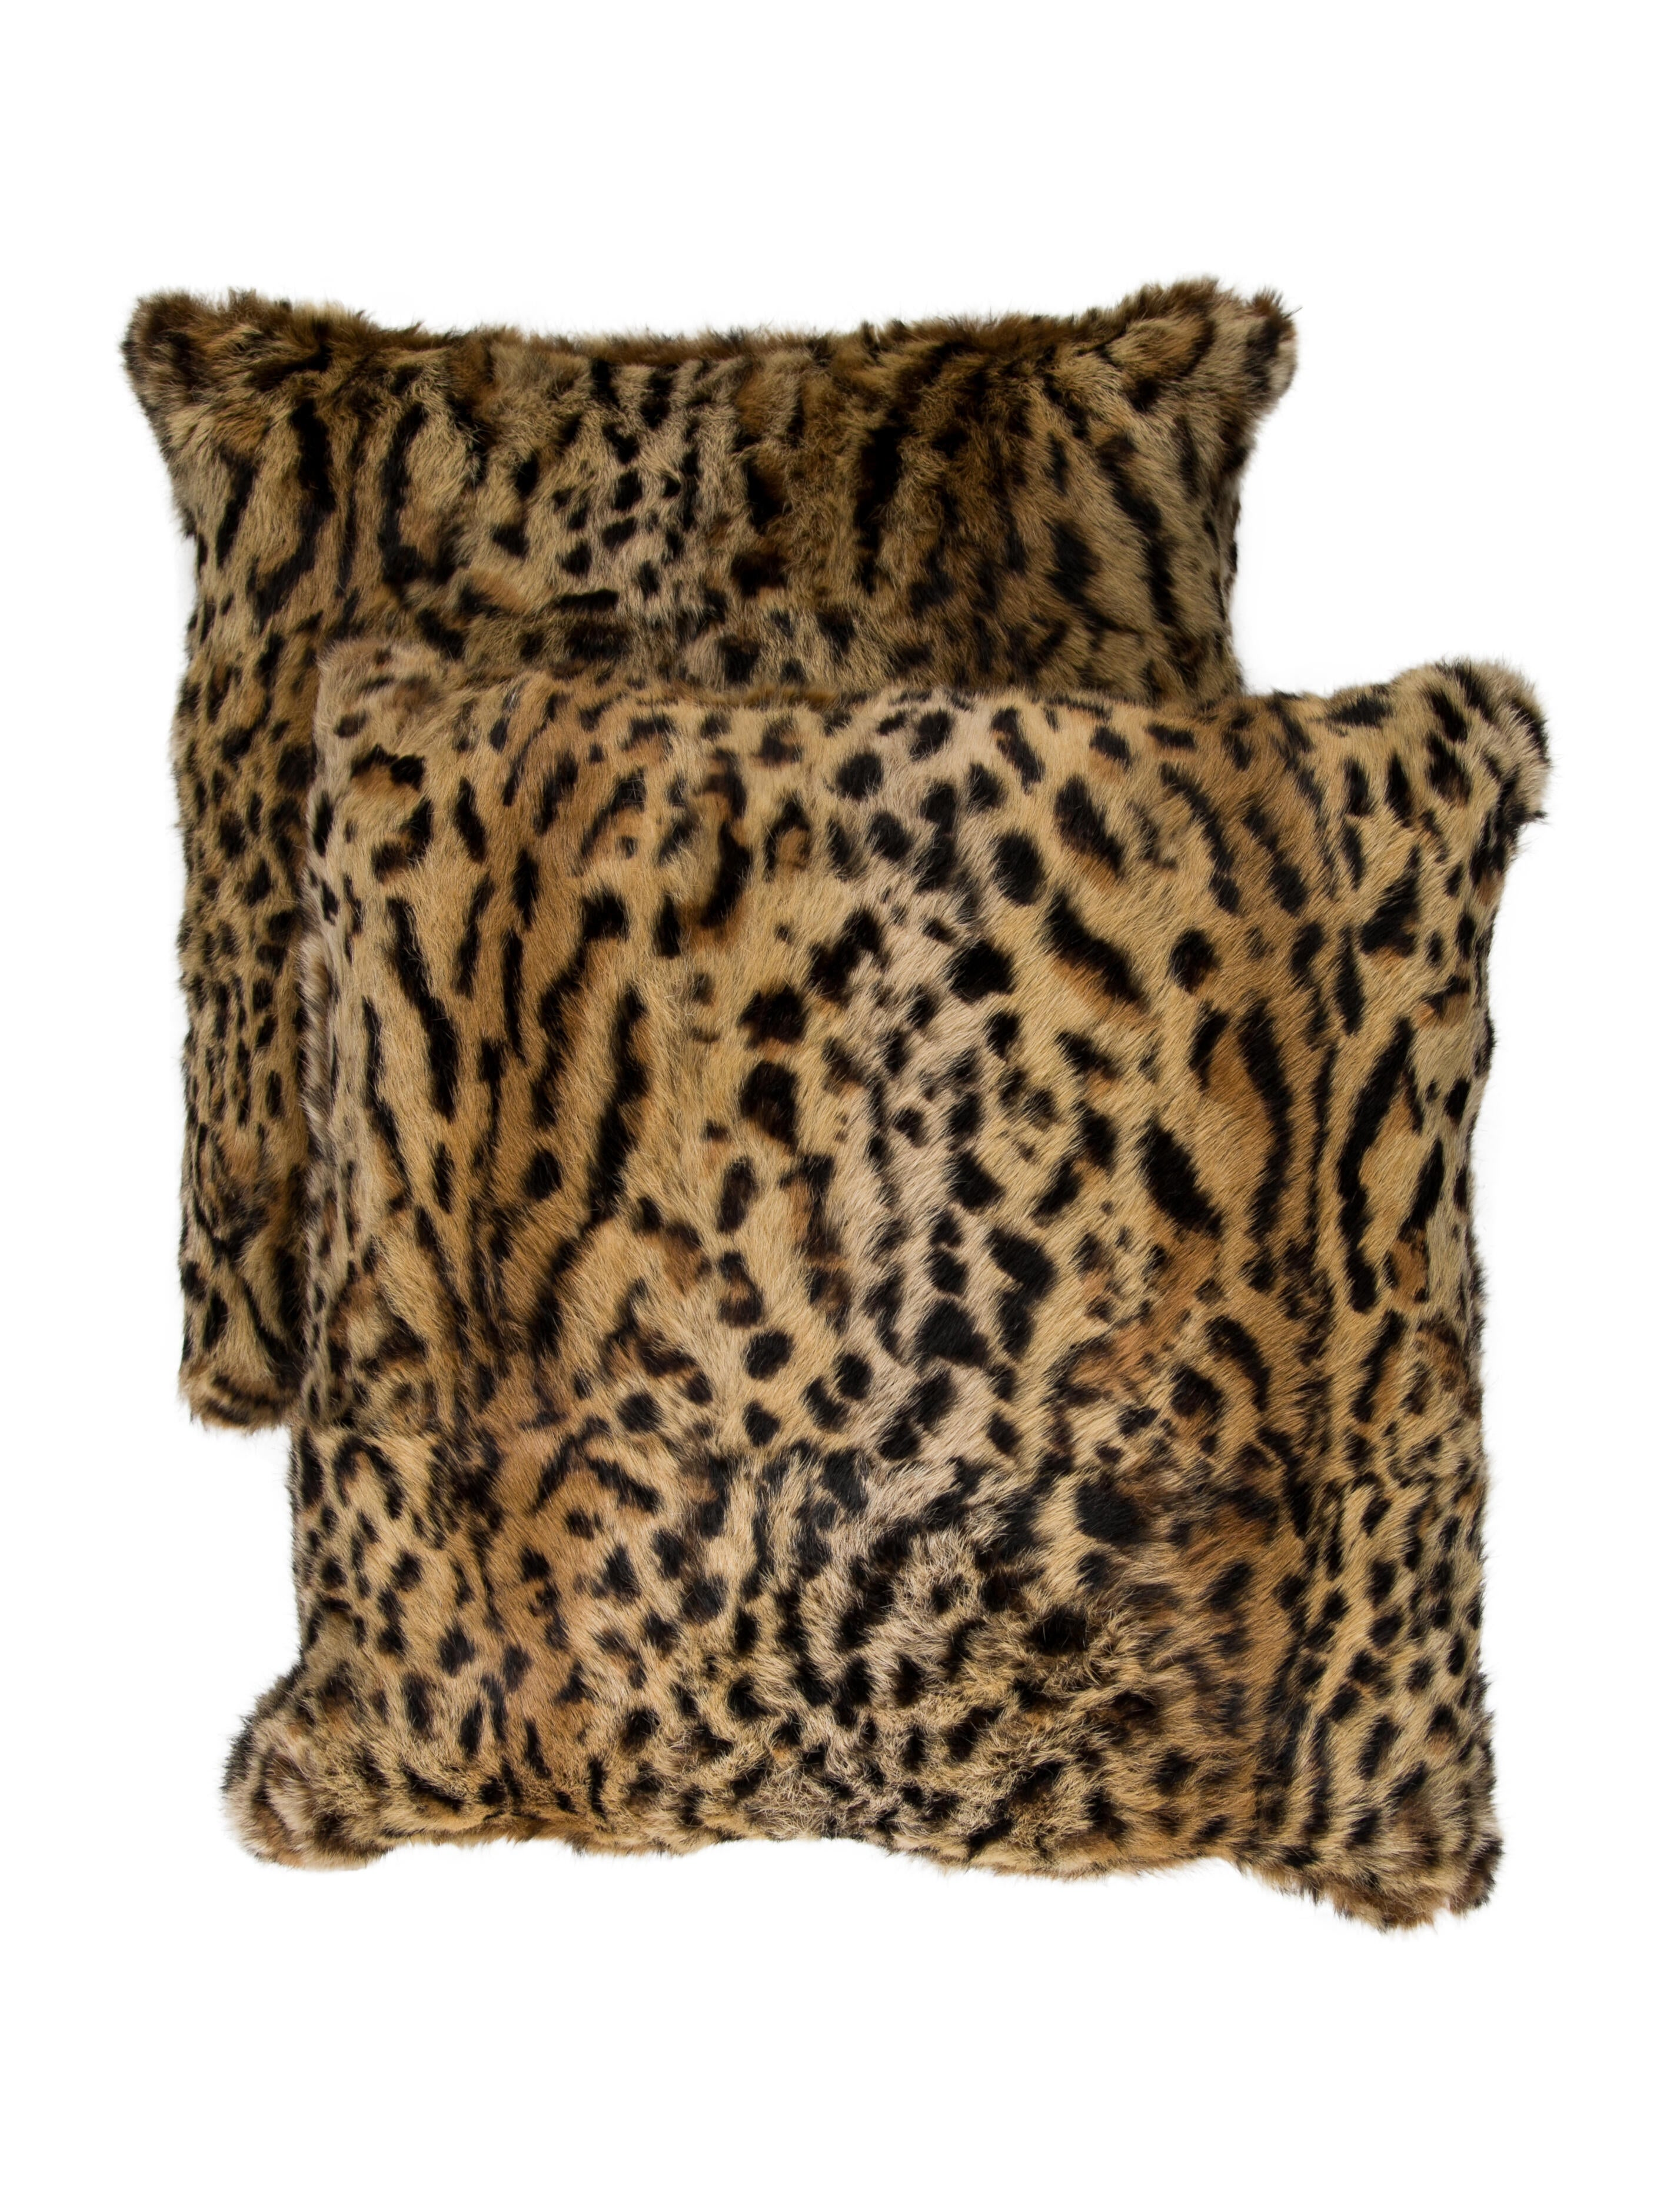 Adrienne Landau Pair Of Rabbit Fur Throw Pillows Pillows Throws The Realreal